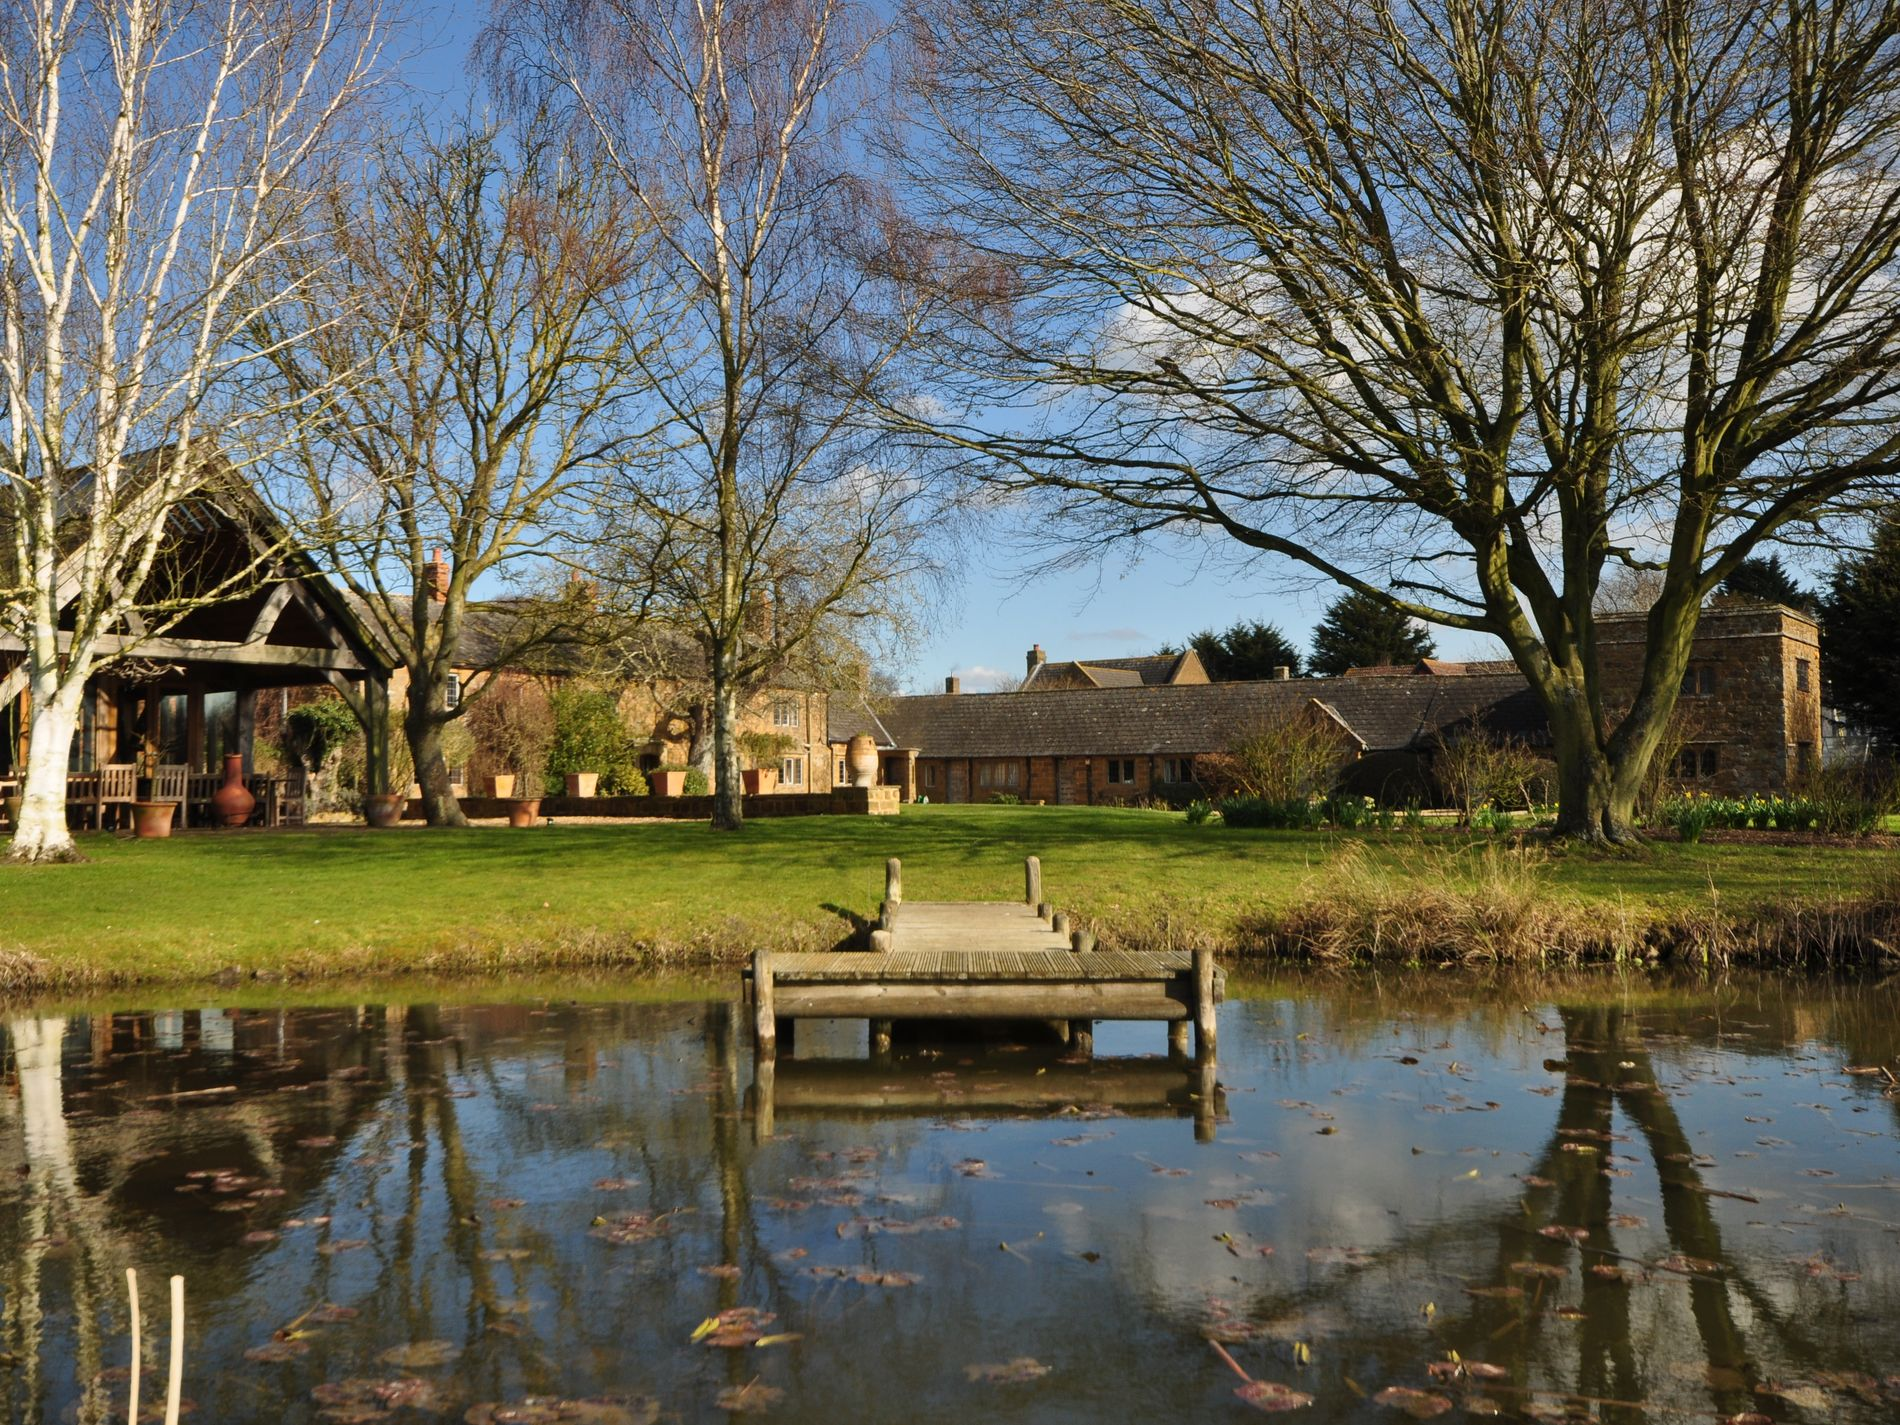 Ornamental lake and grounds